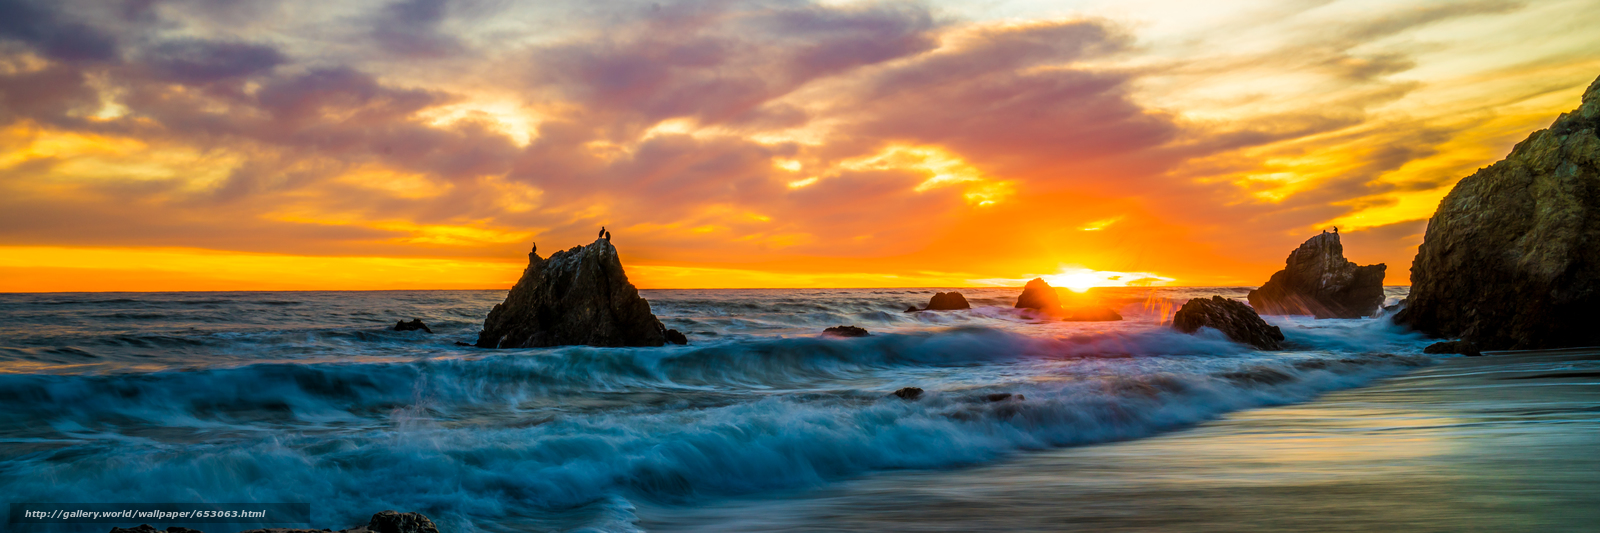 Download wallpaper Malibu,  sunset,  sea,  waves free desktop wallpaper in the resolution 7868x2623 — picture №653063